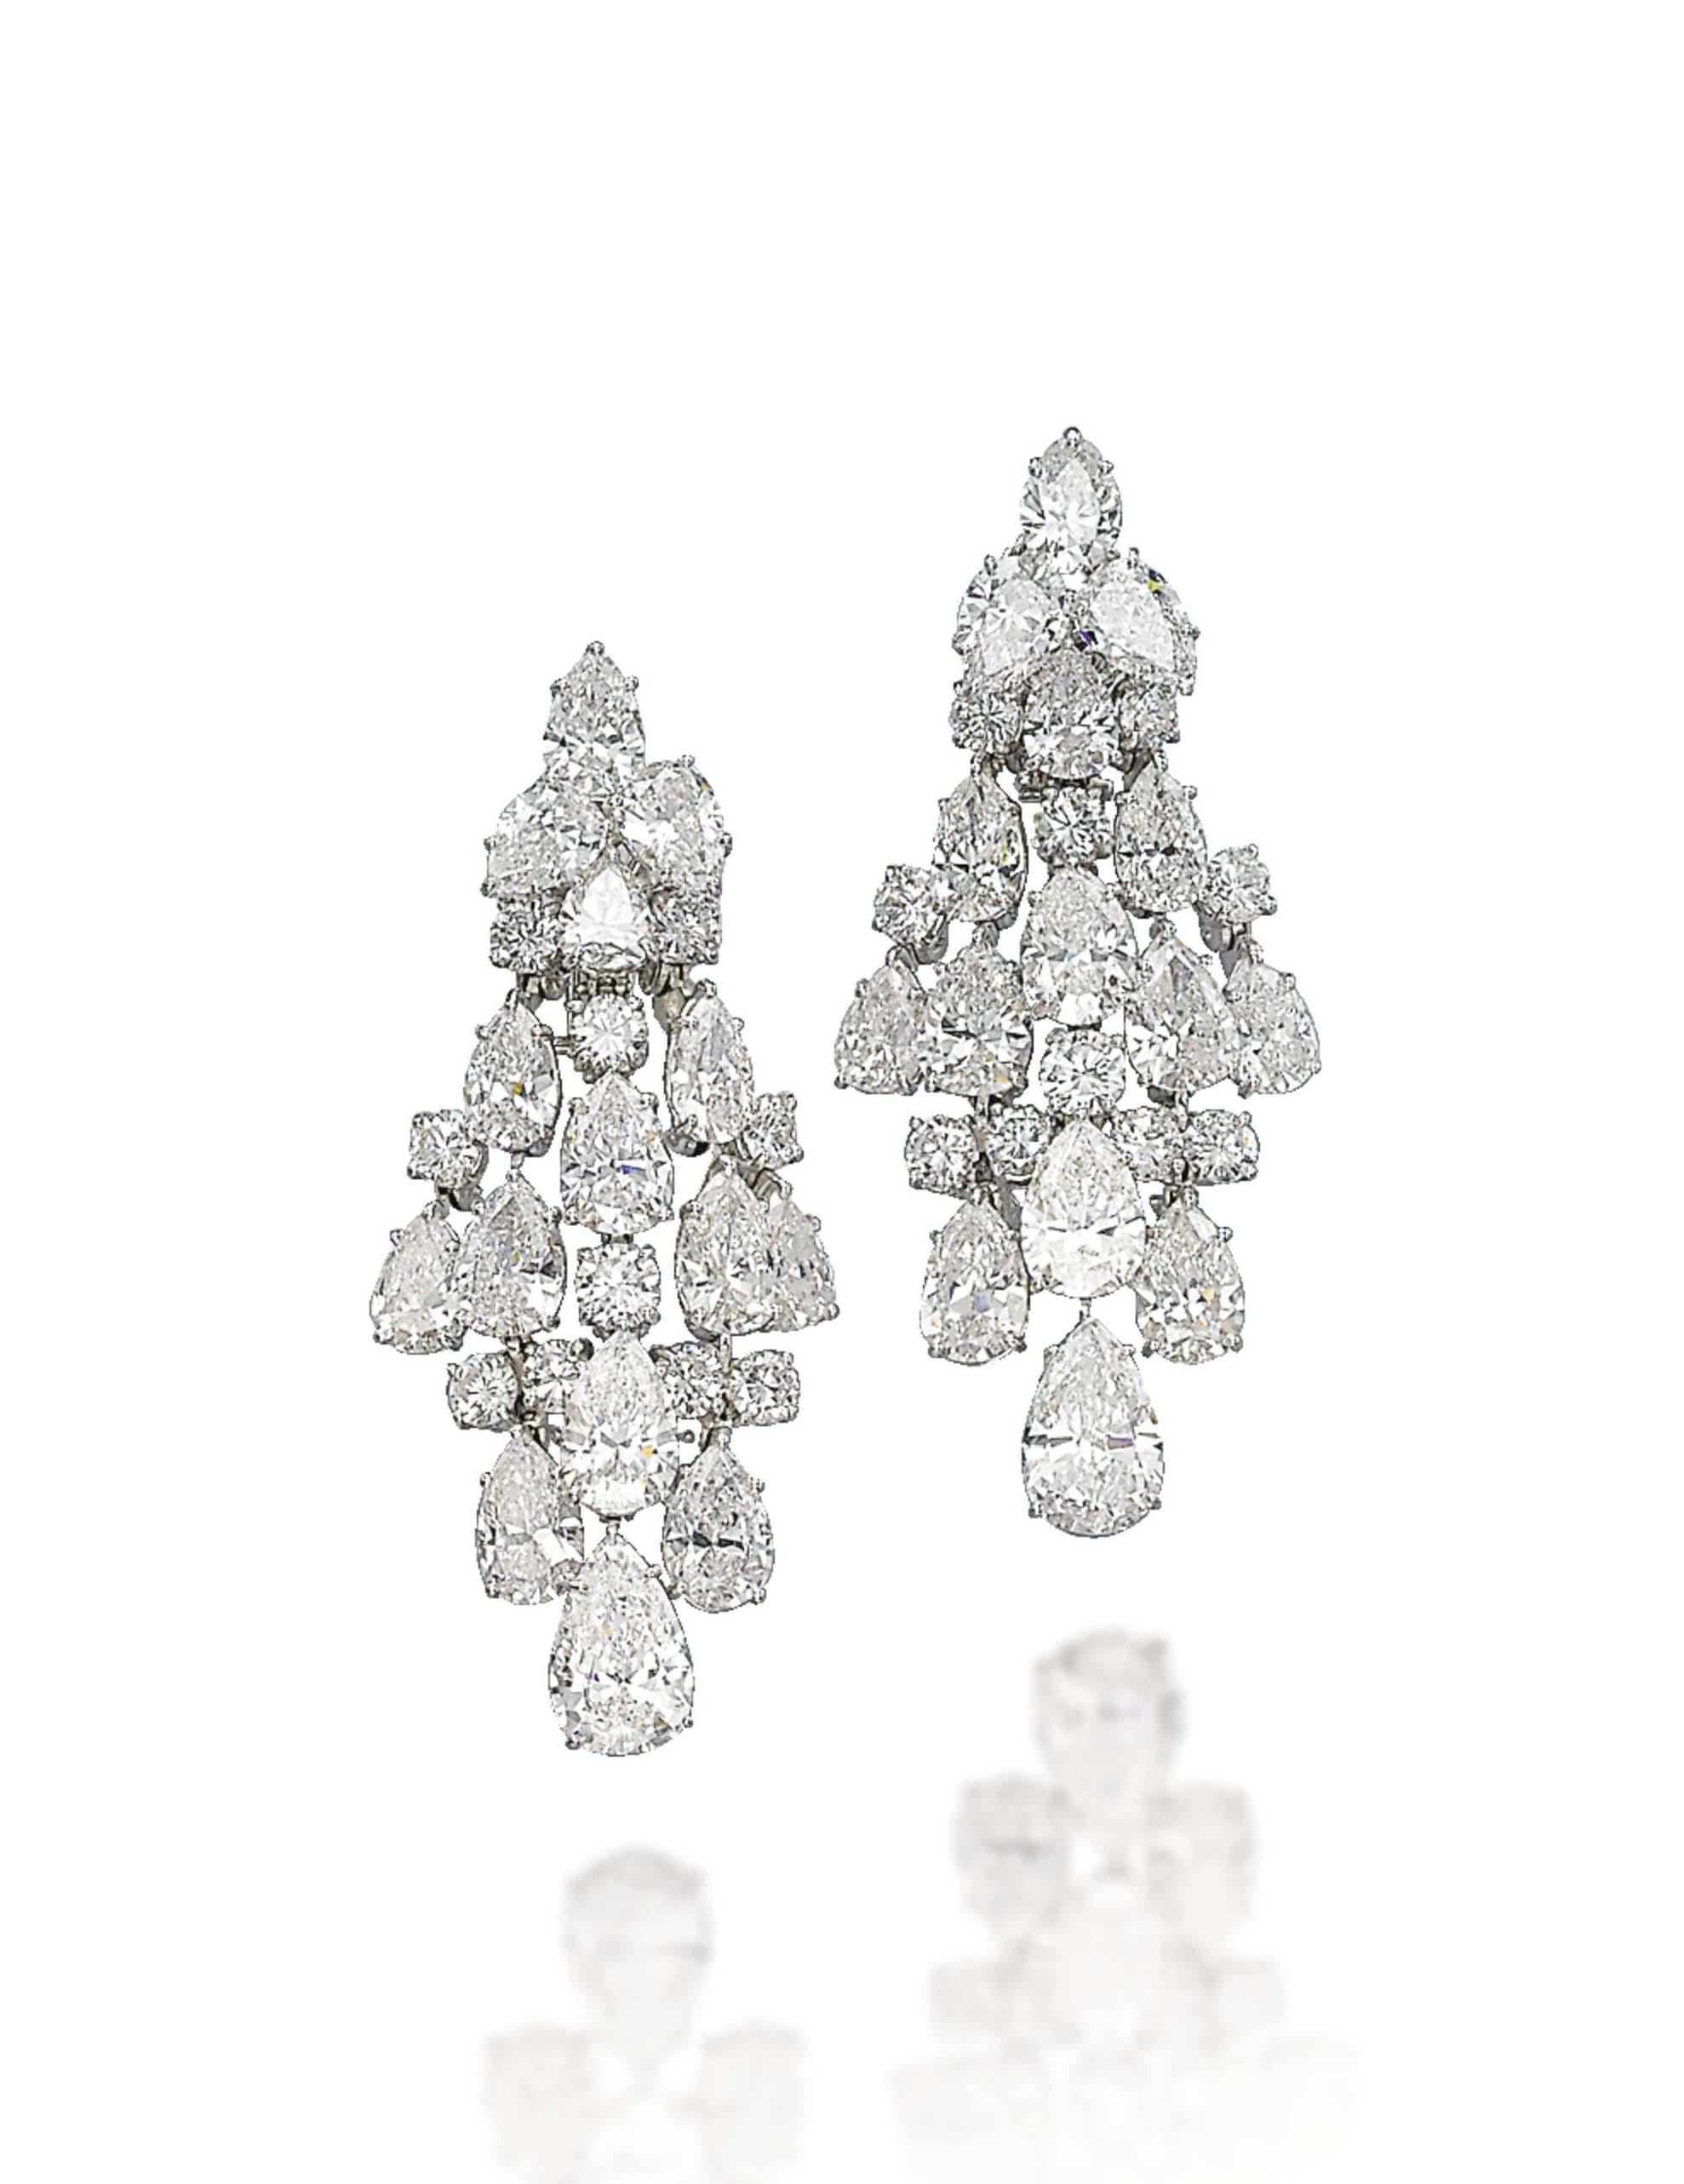 A PAIR OF DIAMOND 'CHANDELIER' EARRINGS